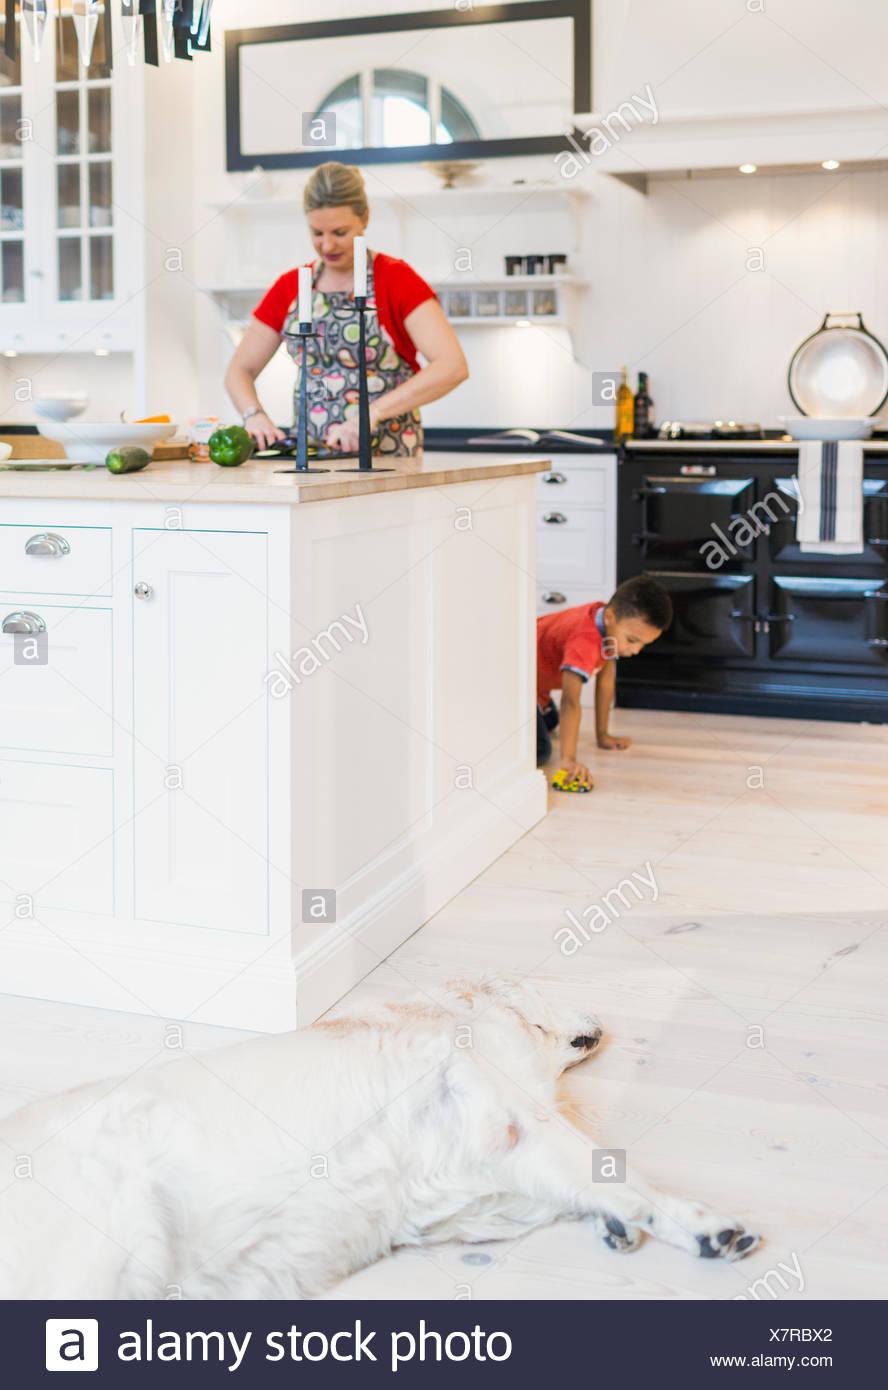 Dog sleeping on hardwood floor with woman cooking in domestic room - Stock Image